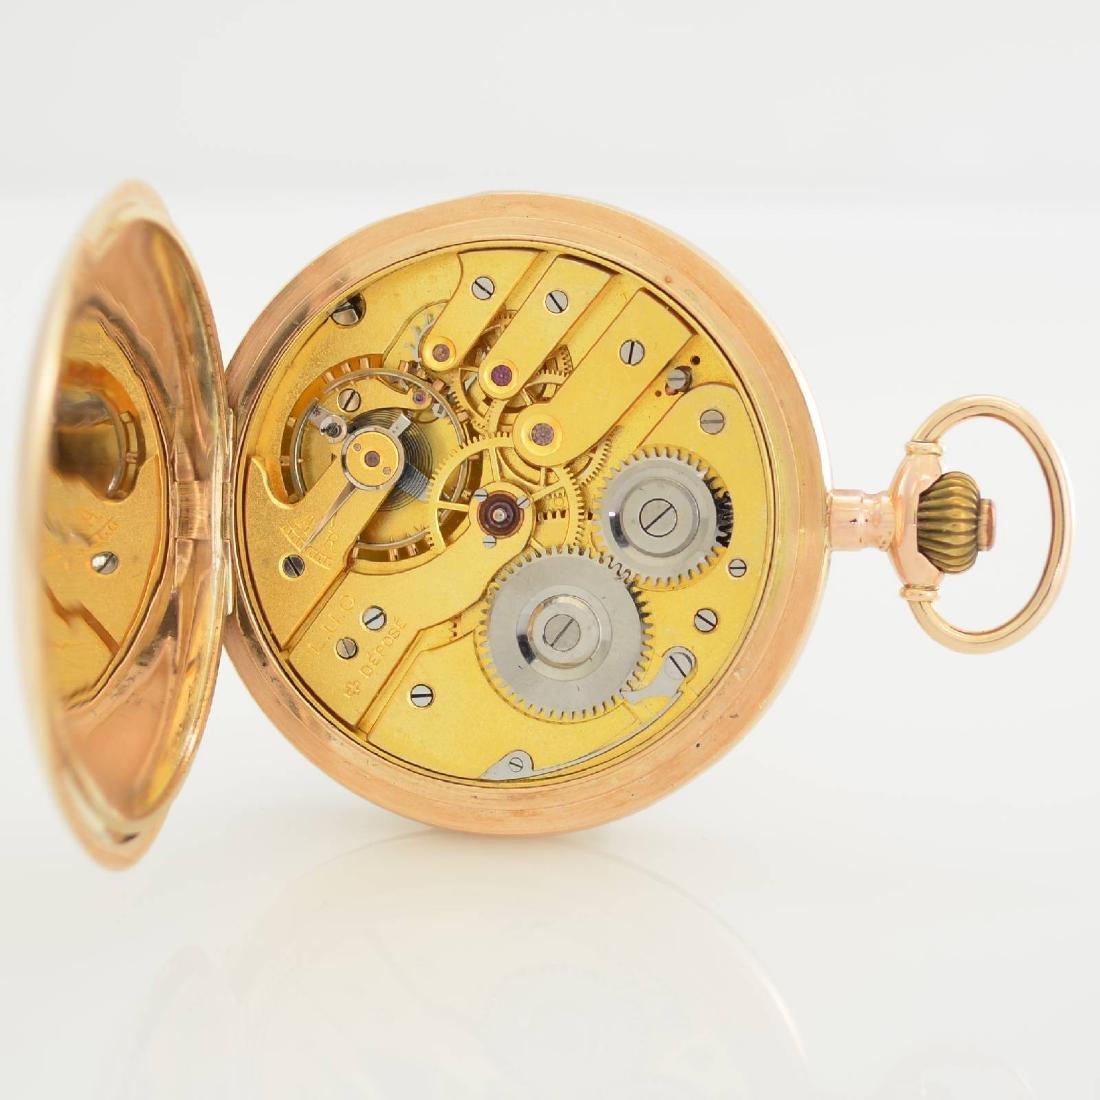 L.U.C. Chopard 14k pink gold pocket watch - 8